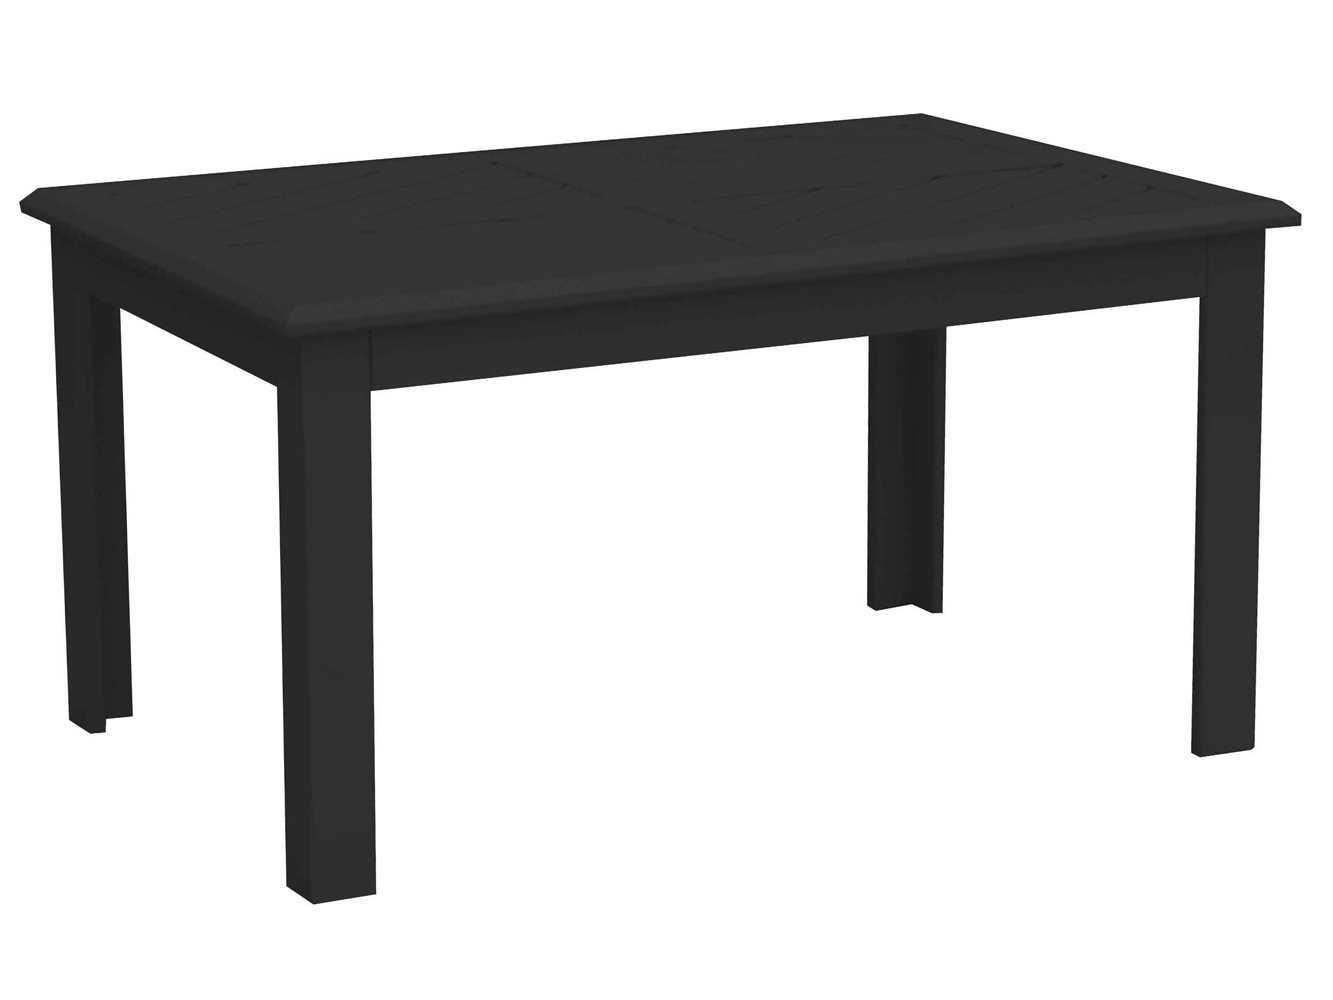 paragon casual talia aluminum 72 x 44 rectangular table 39172g